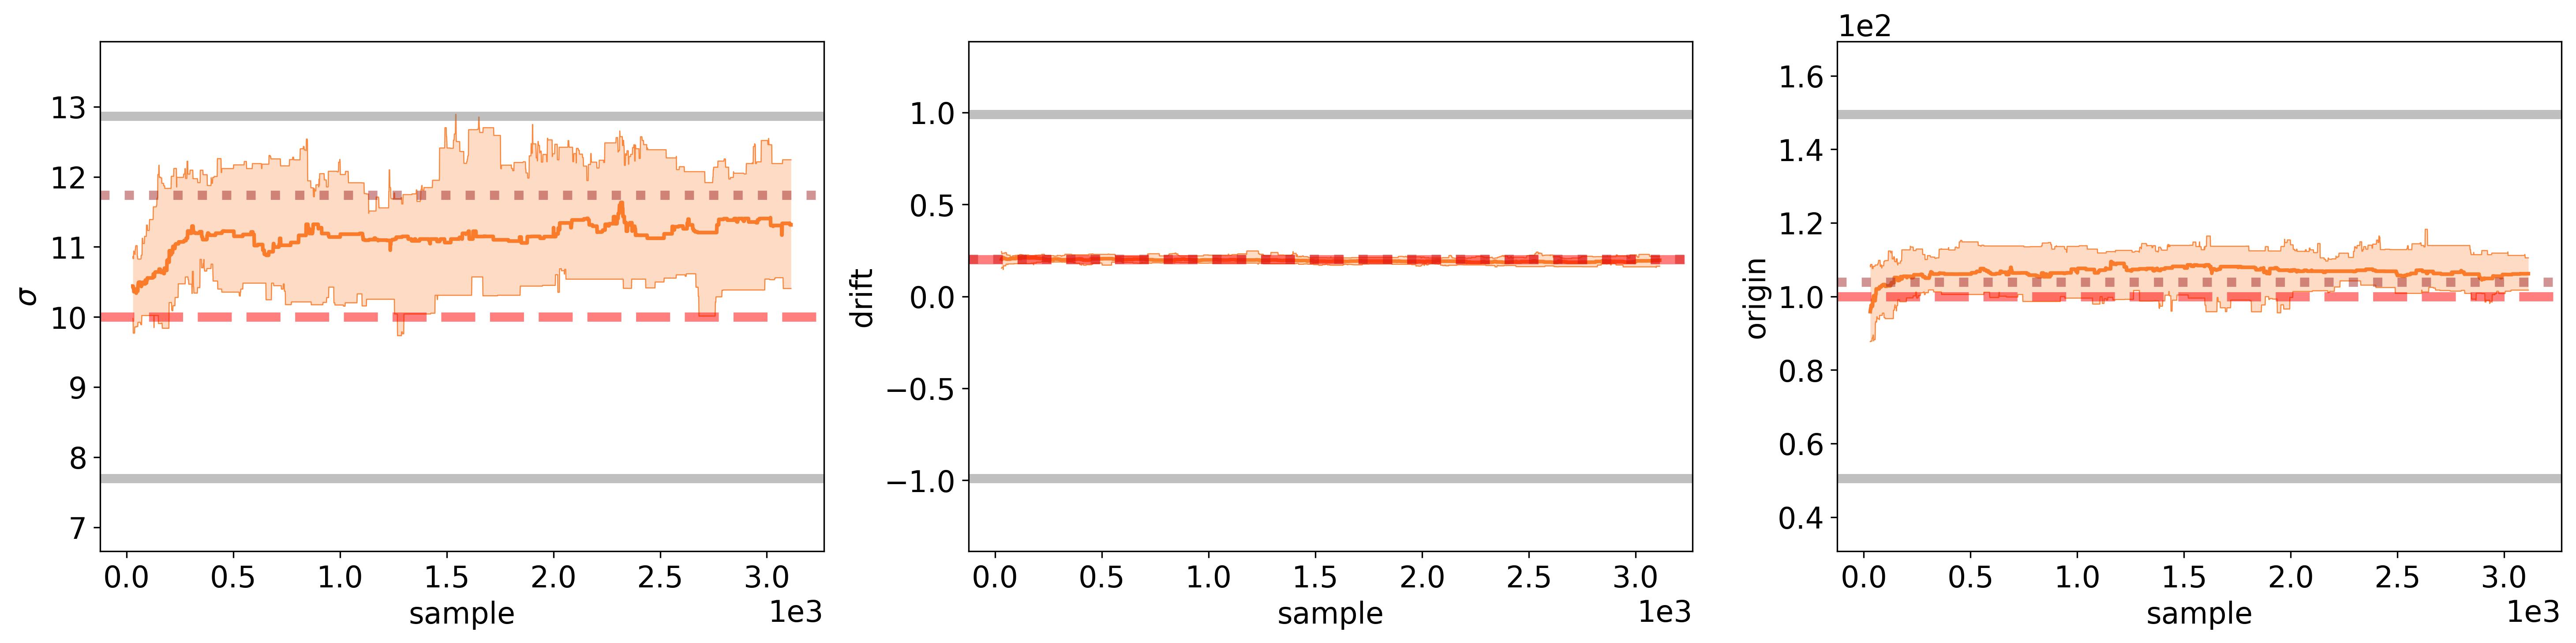 docs/_static/randomwalk/randomwalk_parameters-unbiased.png